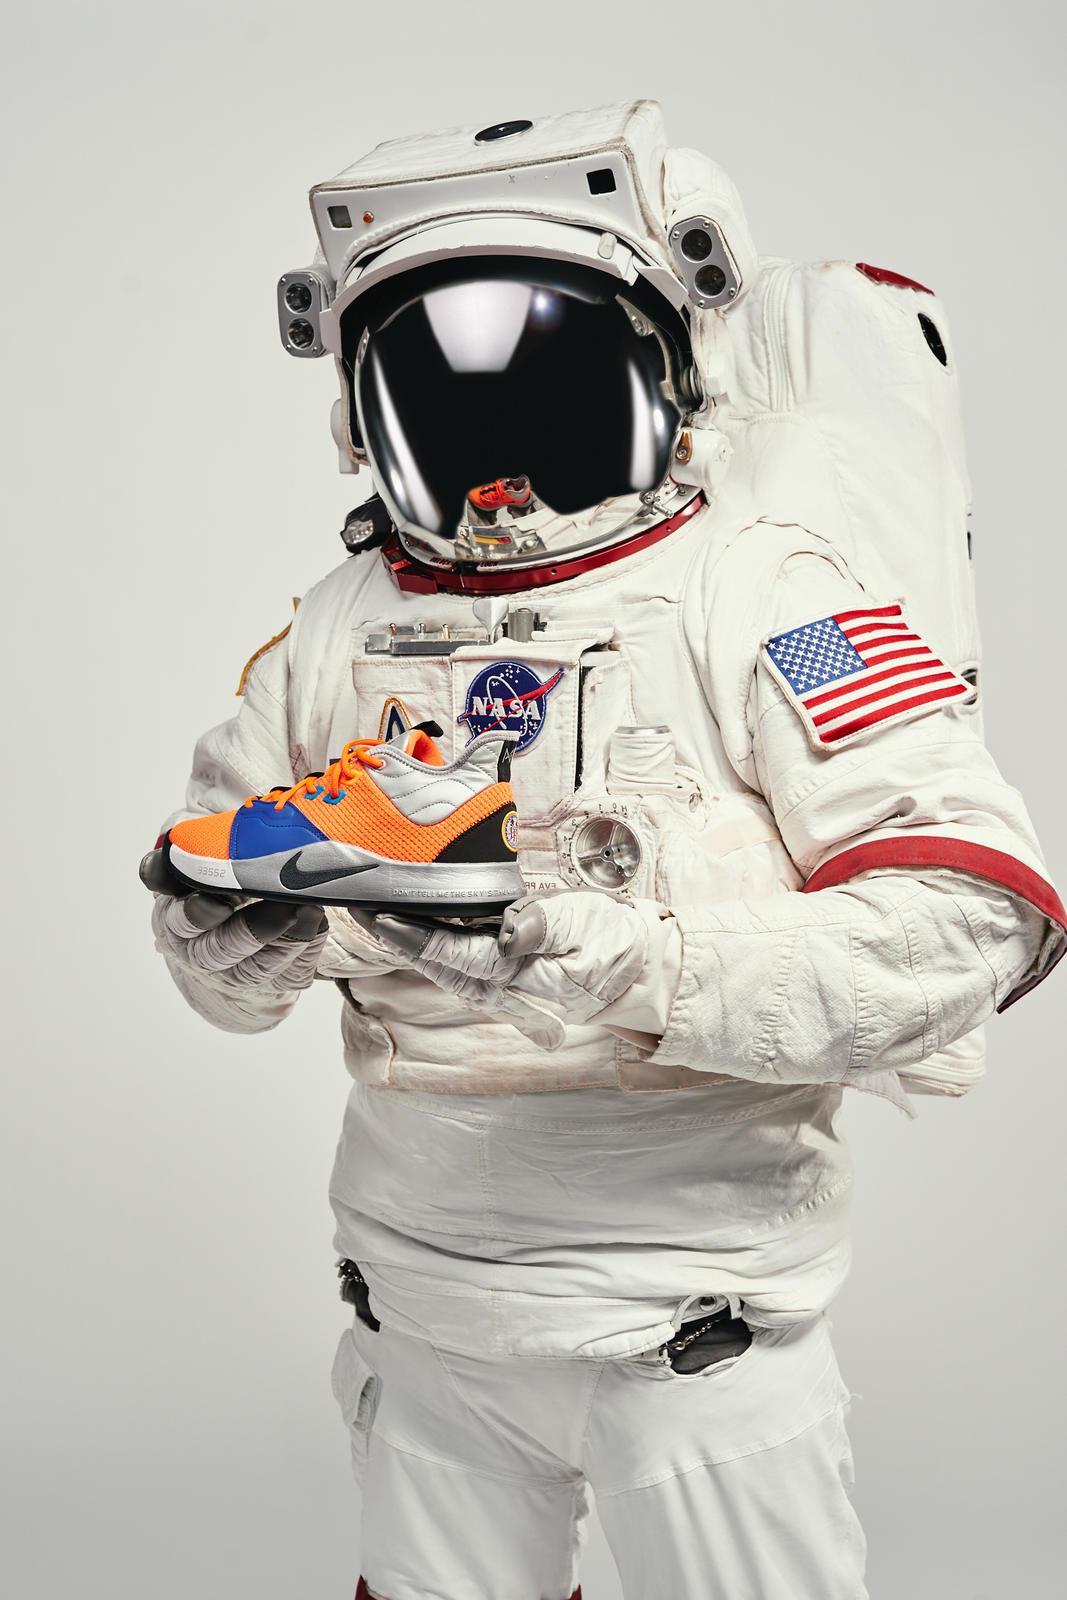 online retailer fd4ef c61f7 NIKE PAUL GEORGE NASA SNEAKERS | The Sinsa The Sinsa ...